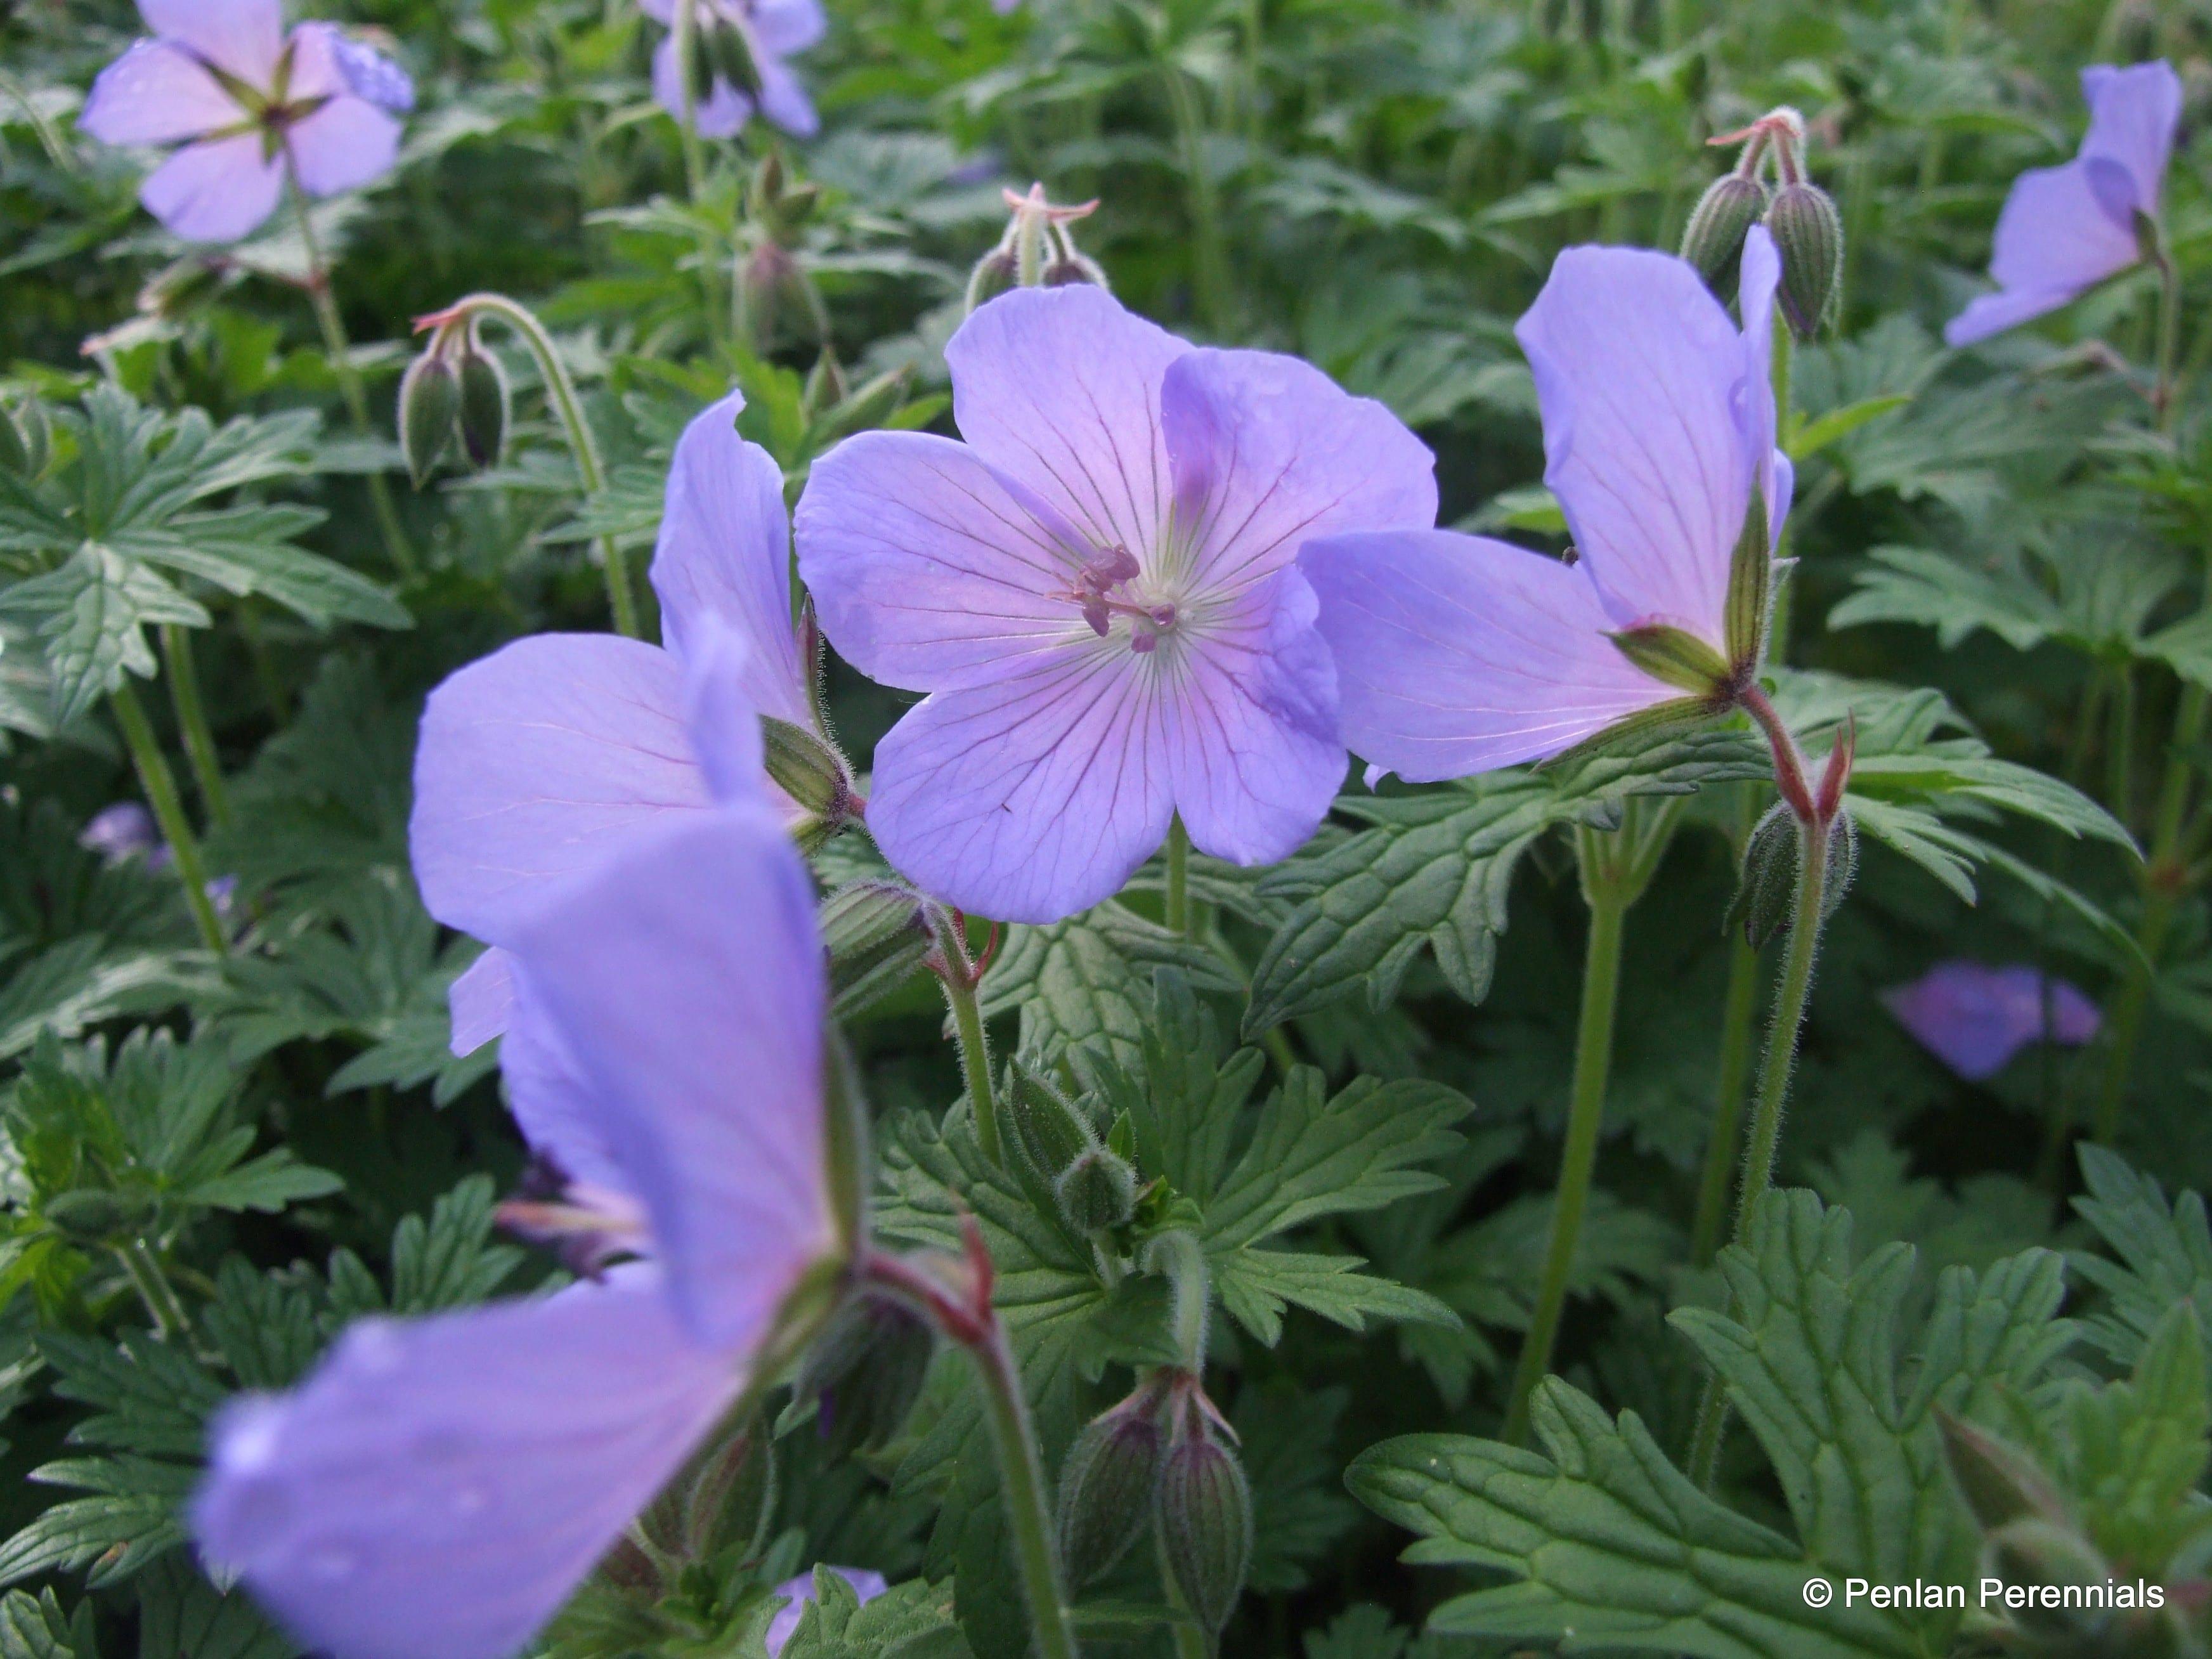 Geranium himalayense 'Irish Blue'